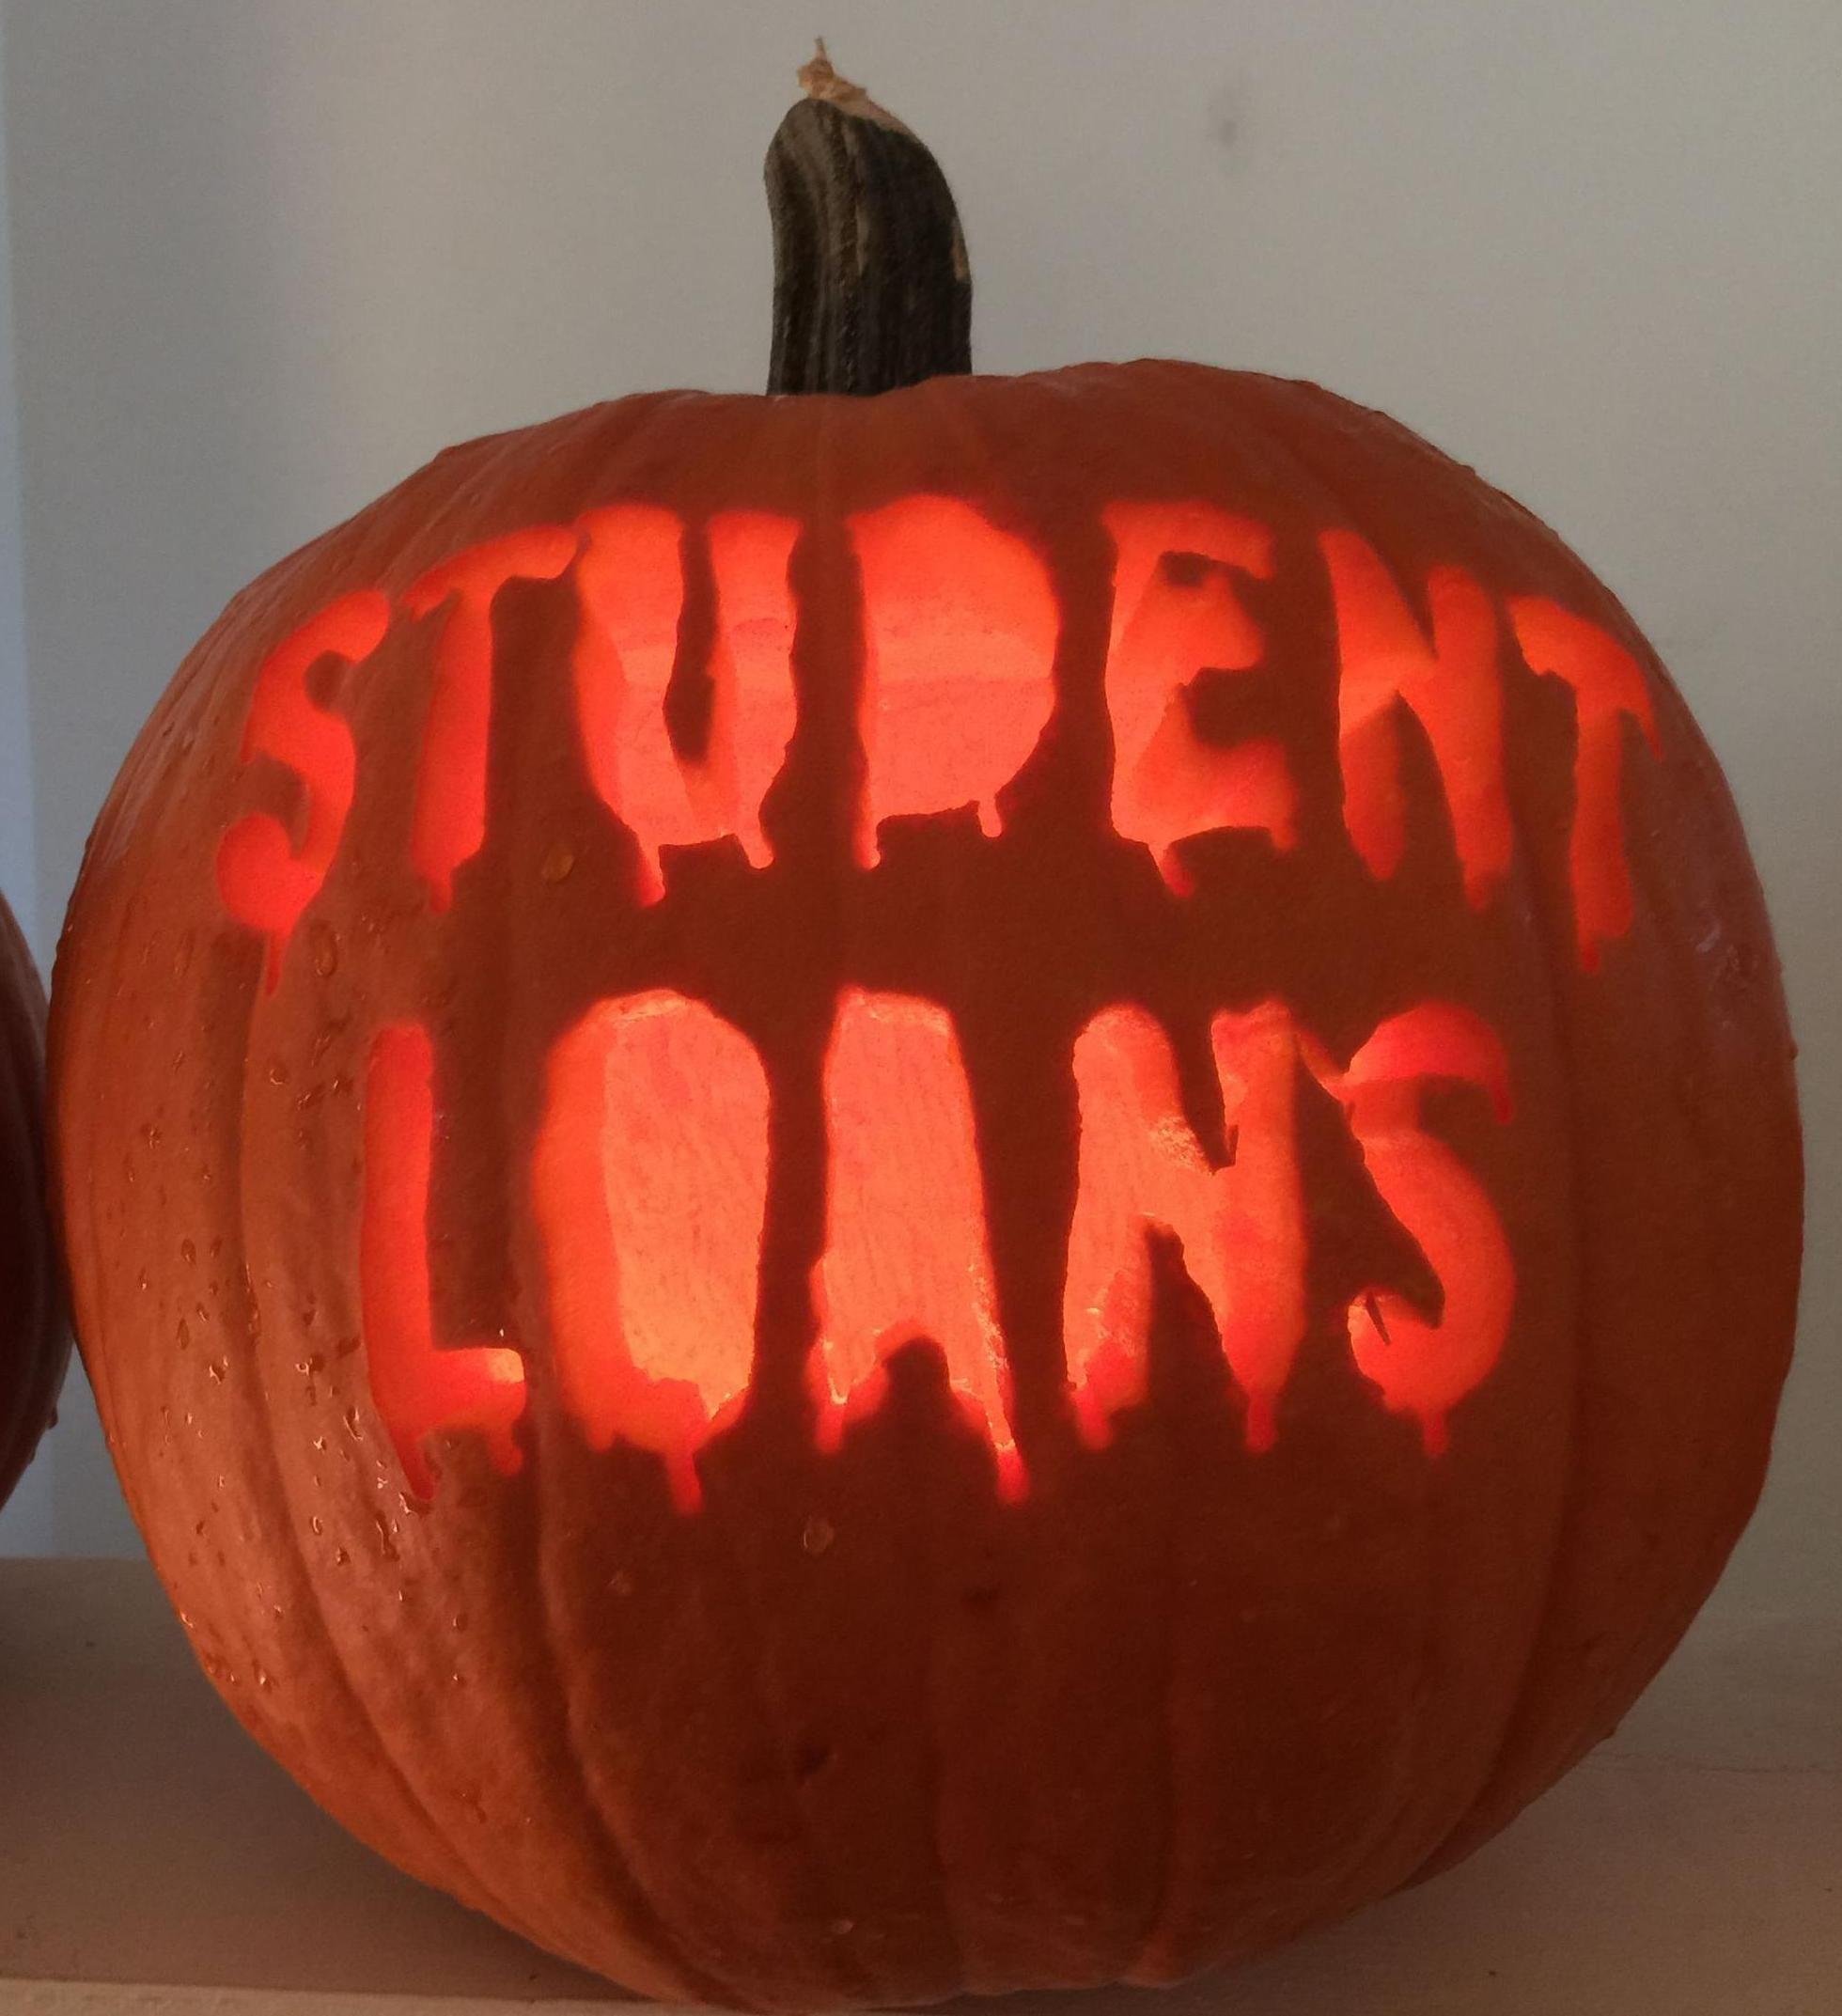 pumpkin student loans Google Search in 2020 Pumpkin